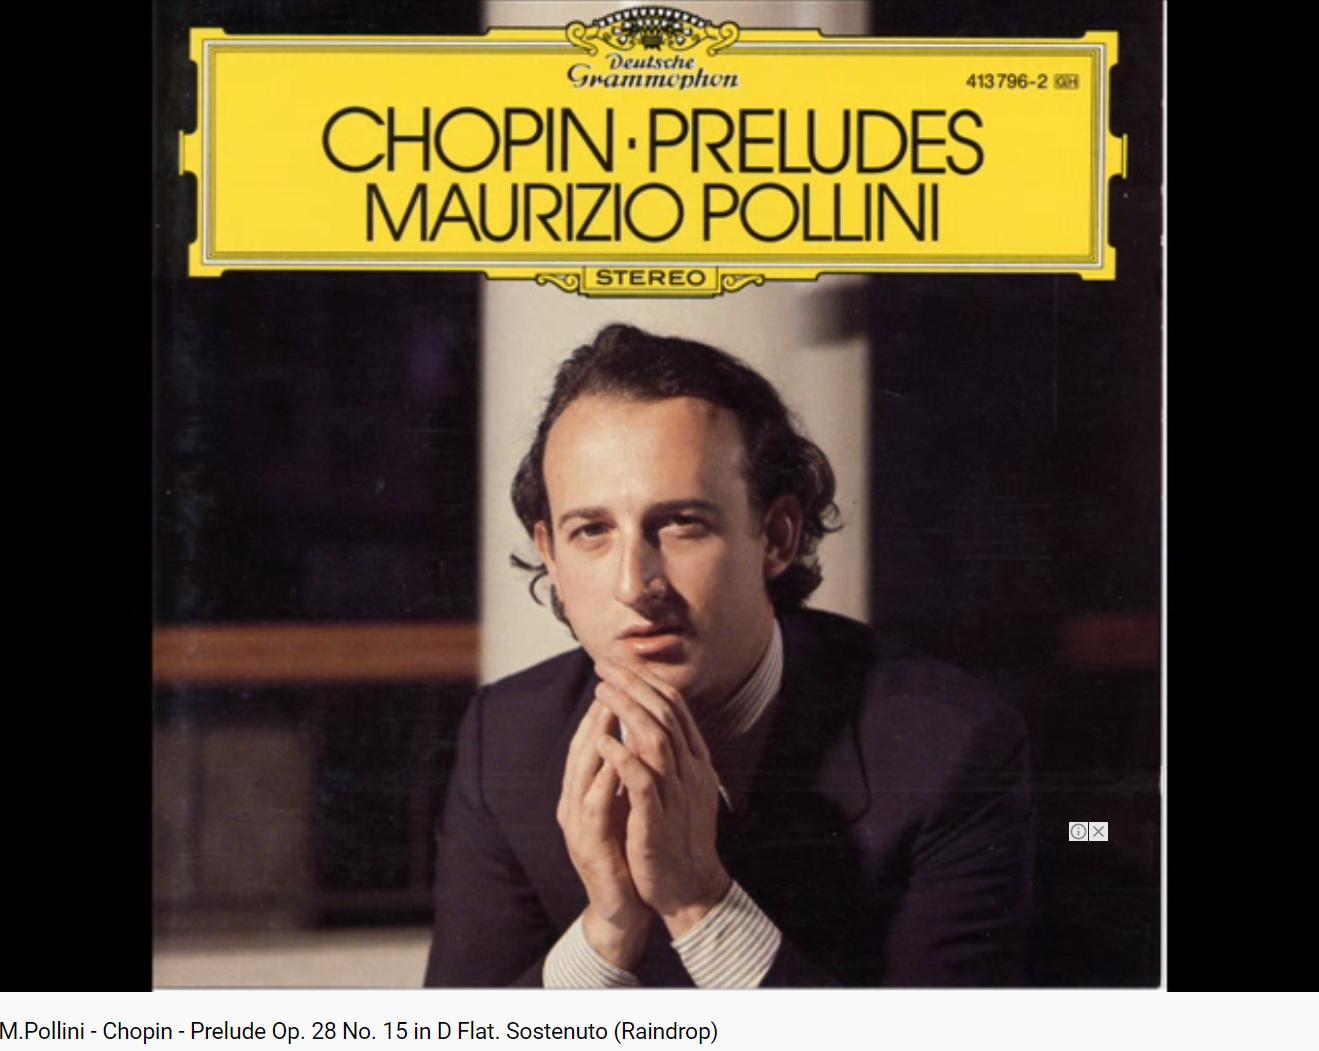 Chopin prélude op 28 n 15